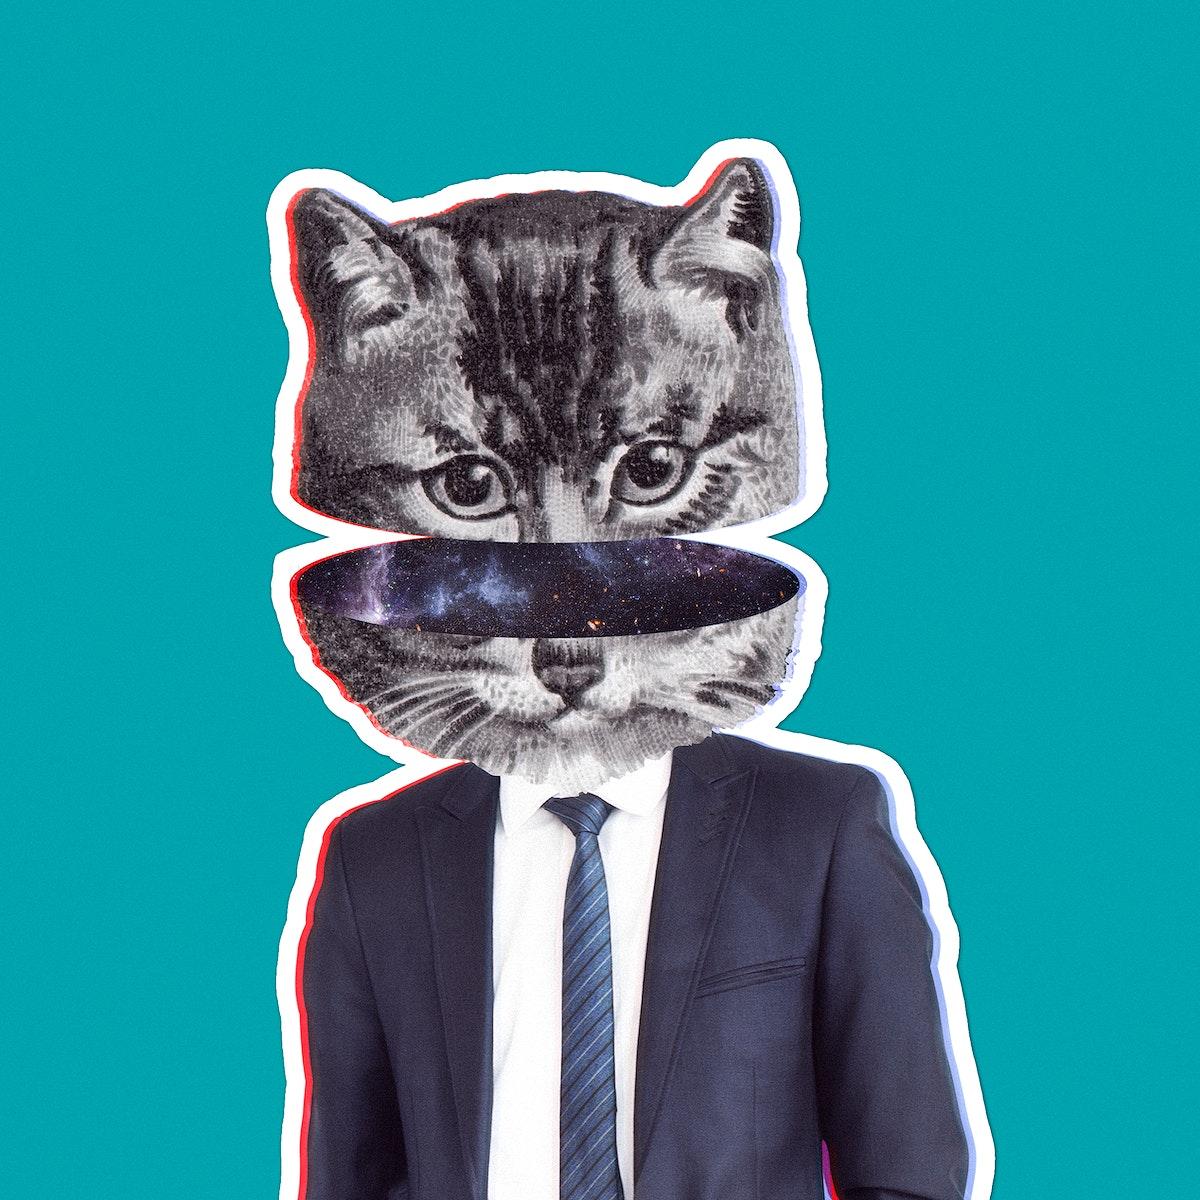 Cat wearing a suit sticker illustration